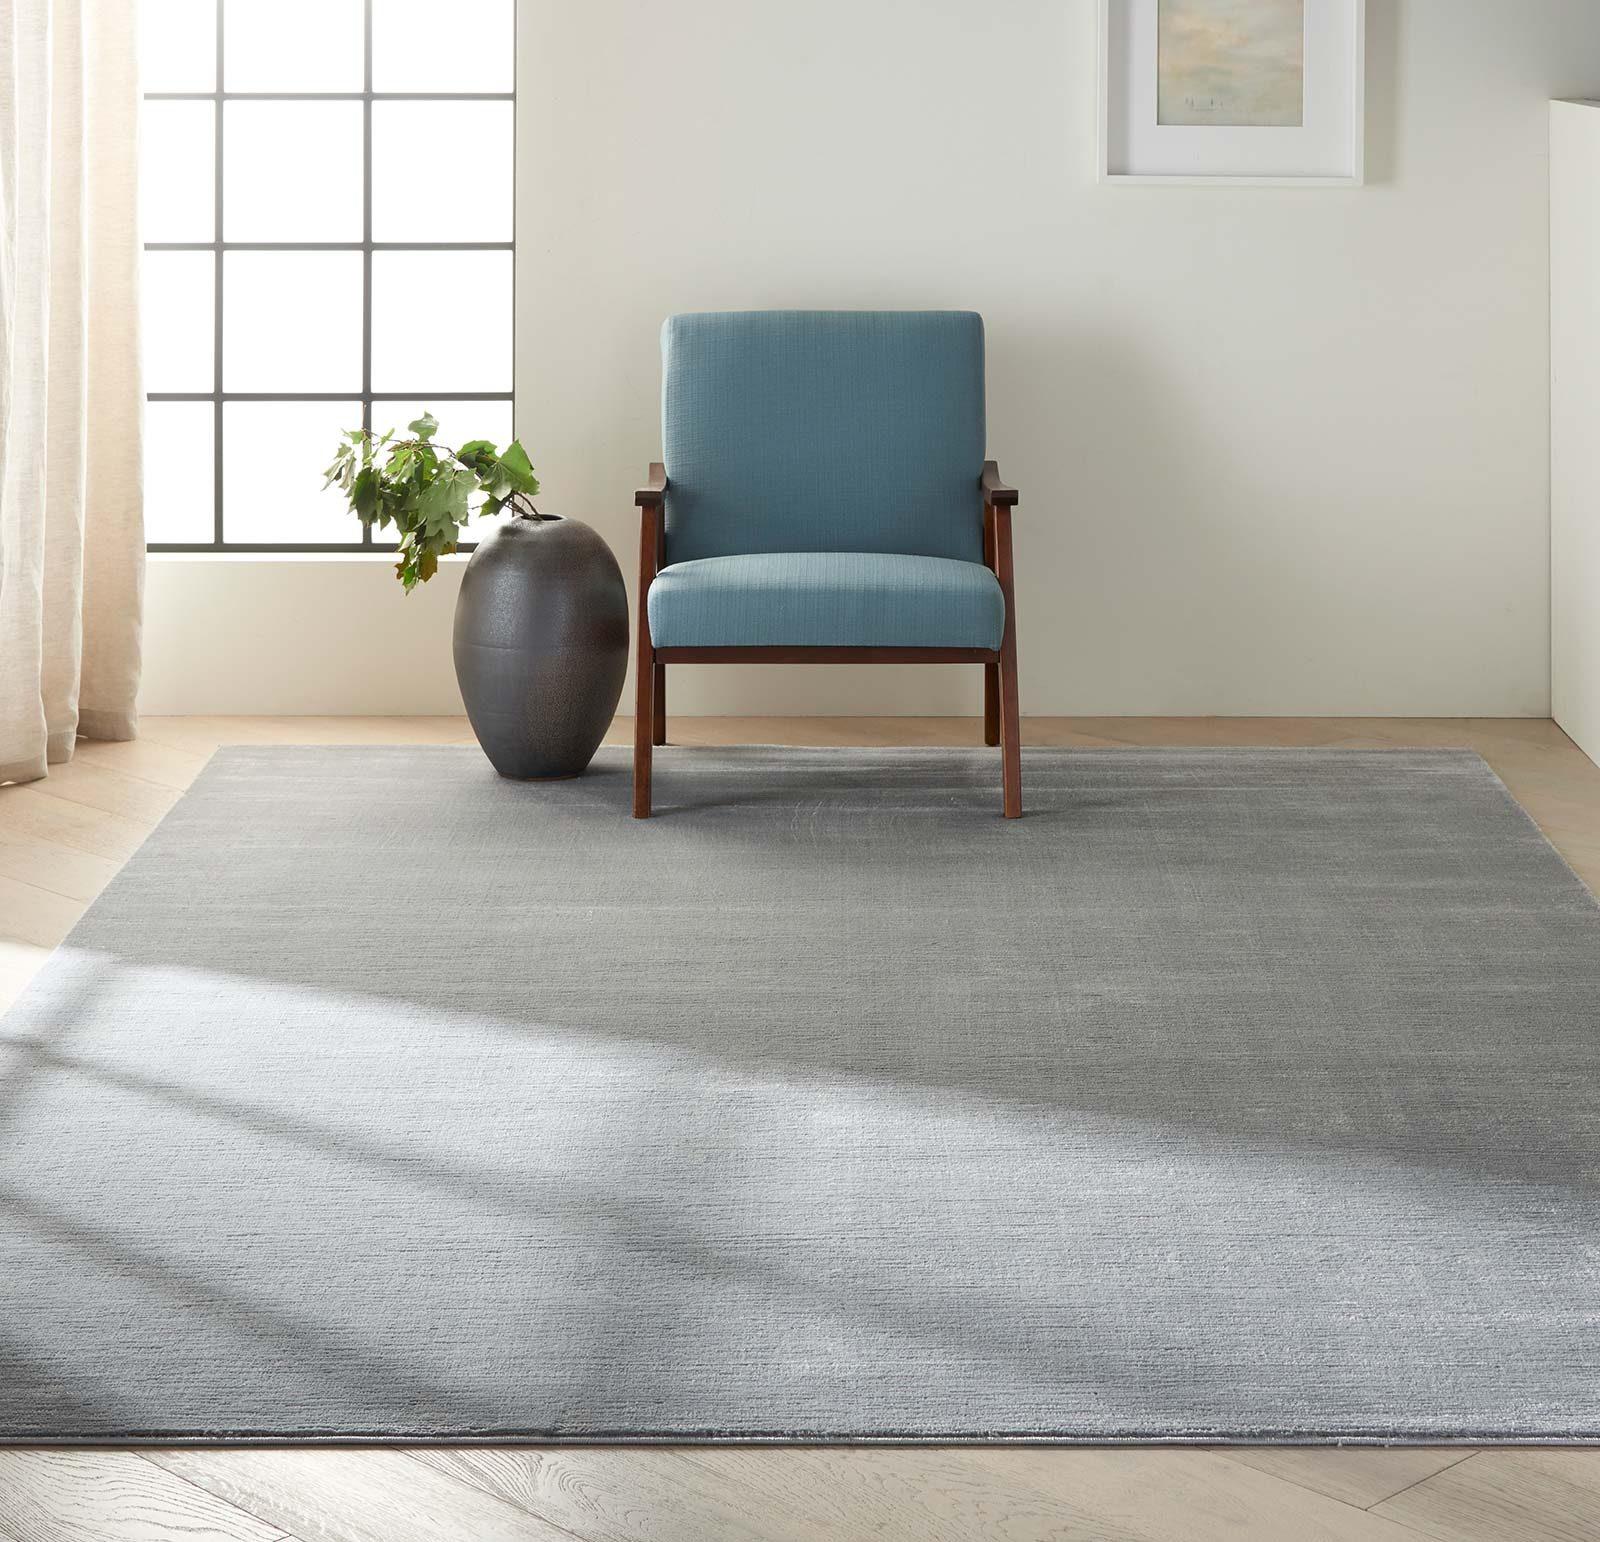 Calvin Klein rug Jackson CK780 CK781 GREY 8x11 099446356291 interior 1 C